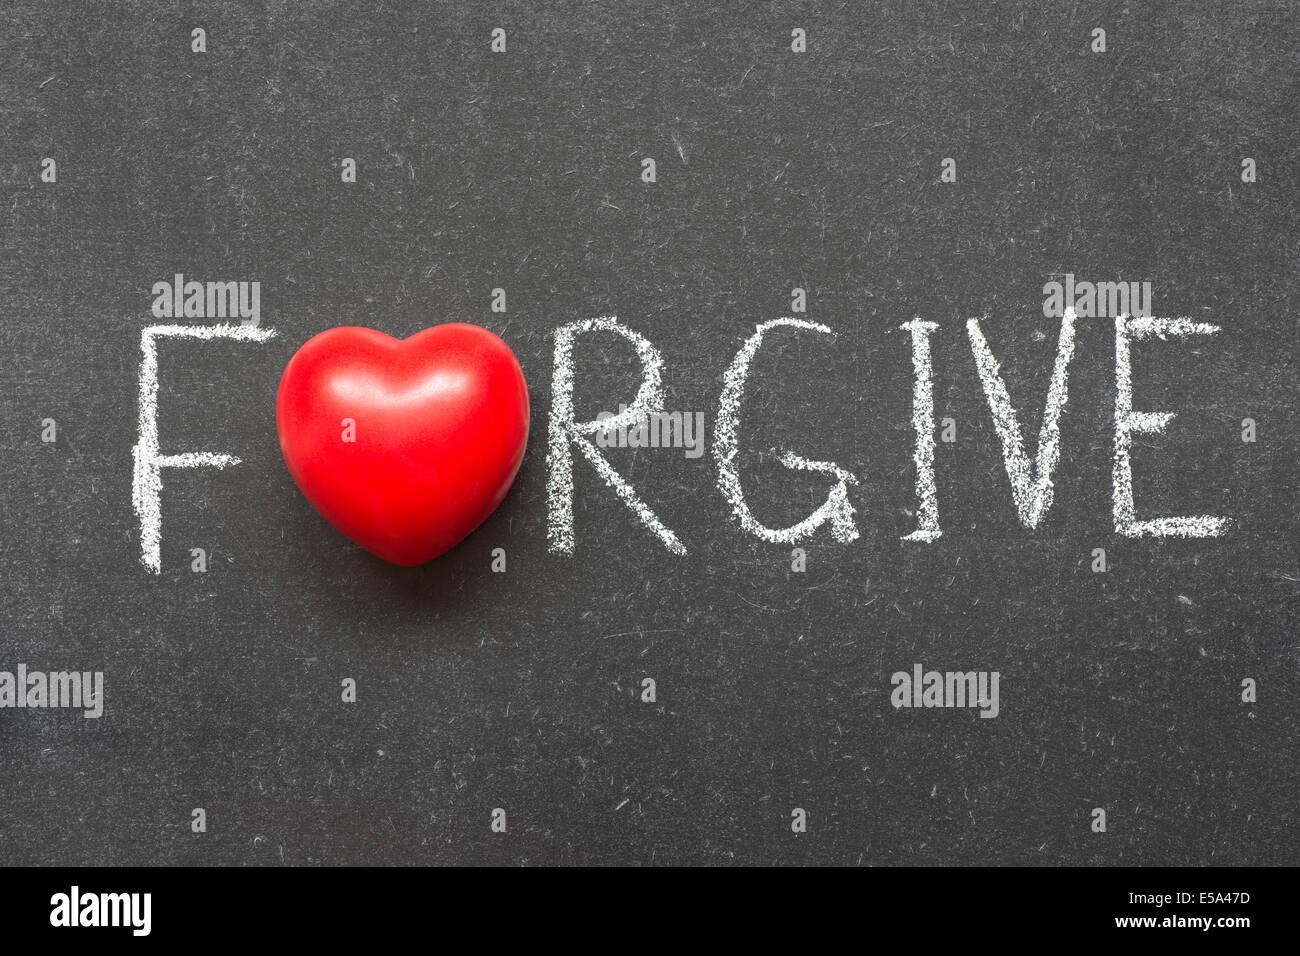 Forgive word handwritten on chalkboard with heart symbol instead forgive word handwritten on chalkboard with heart symbol instead of o biocorpaavc